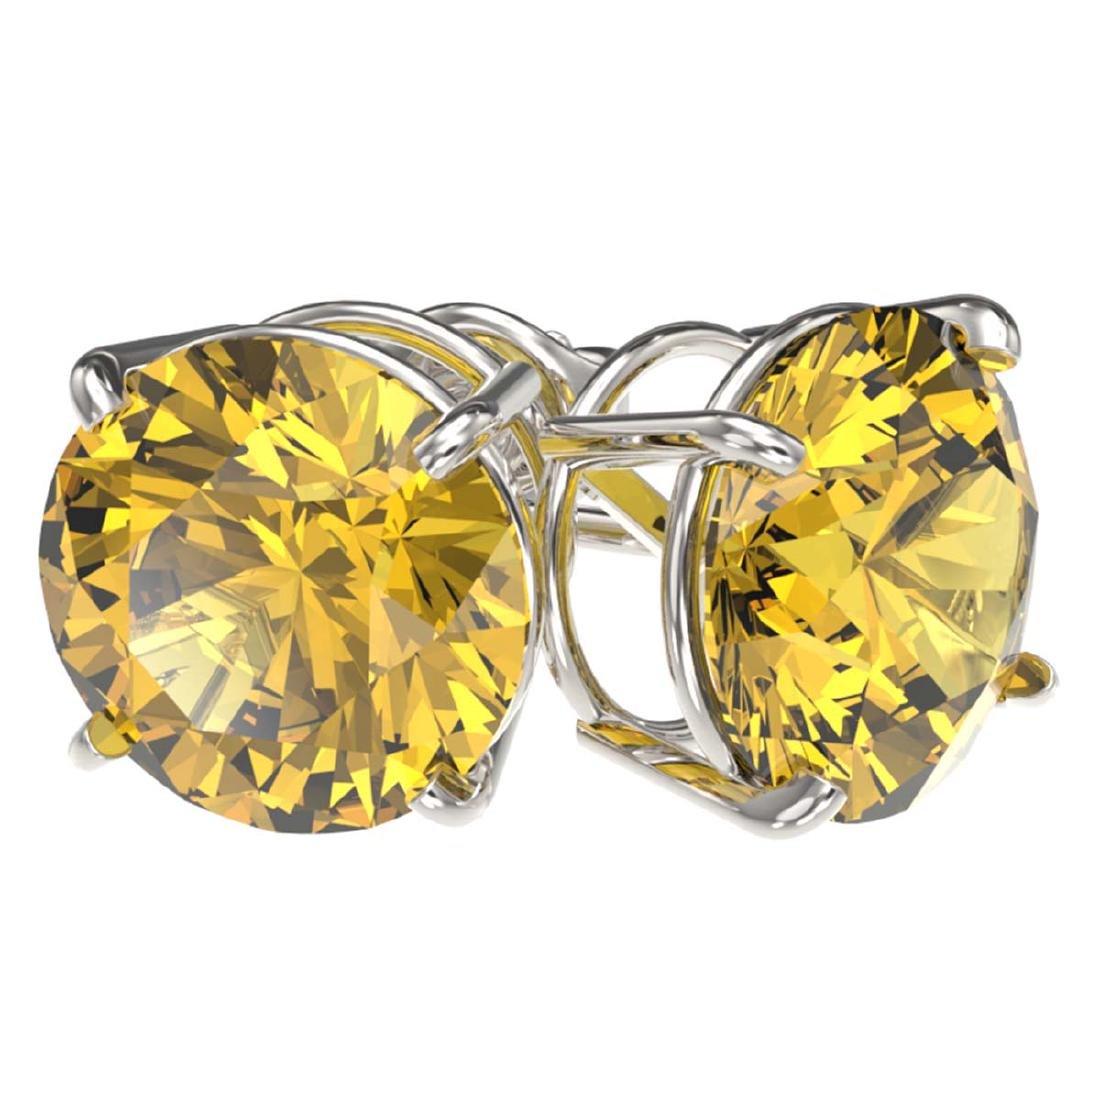 4 ctw Intense Yellow Diamond Stud Earrings 10K White - 3